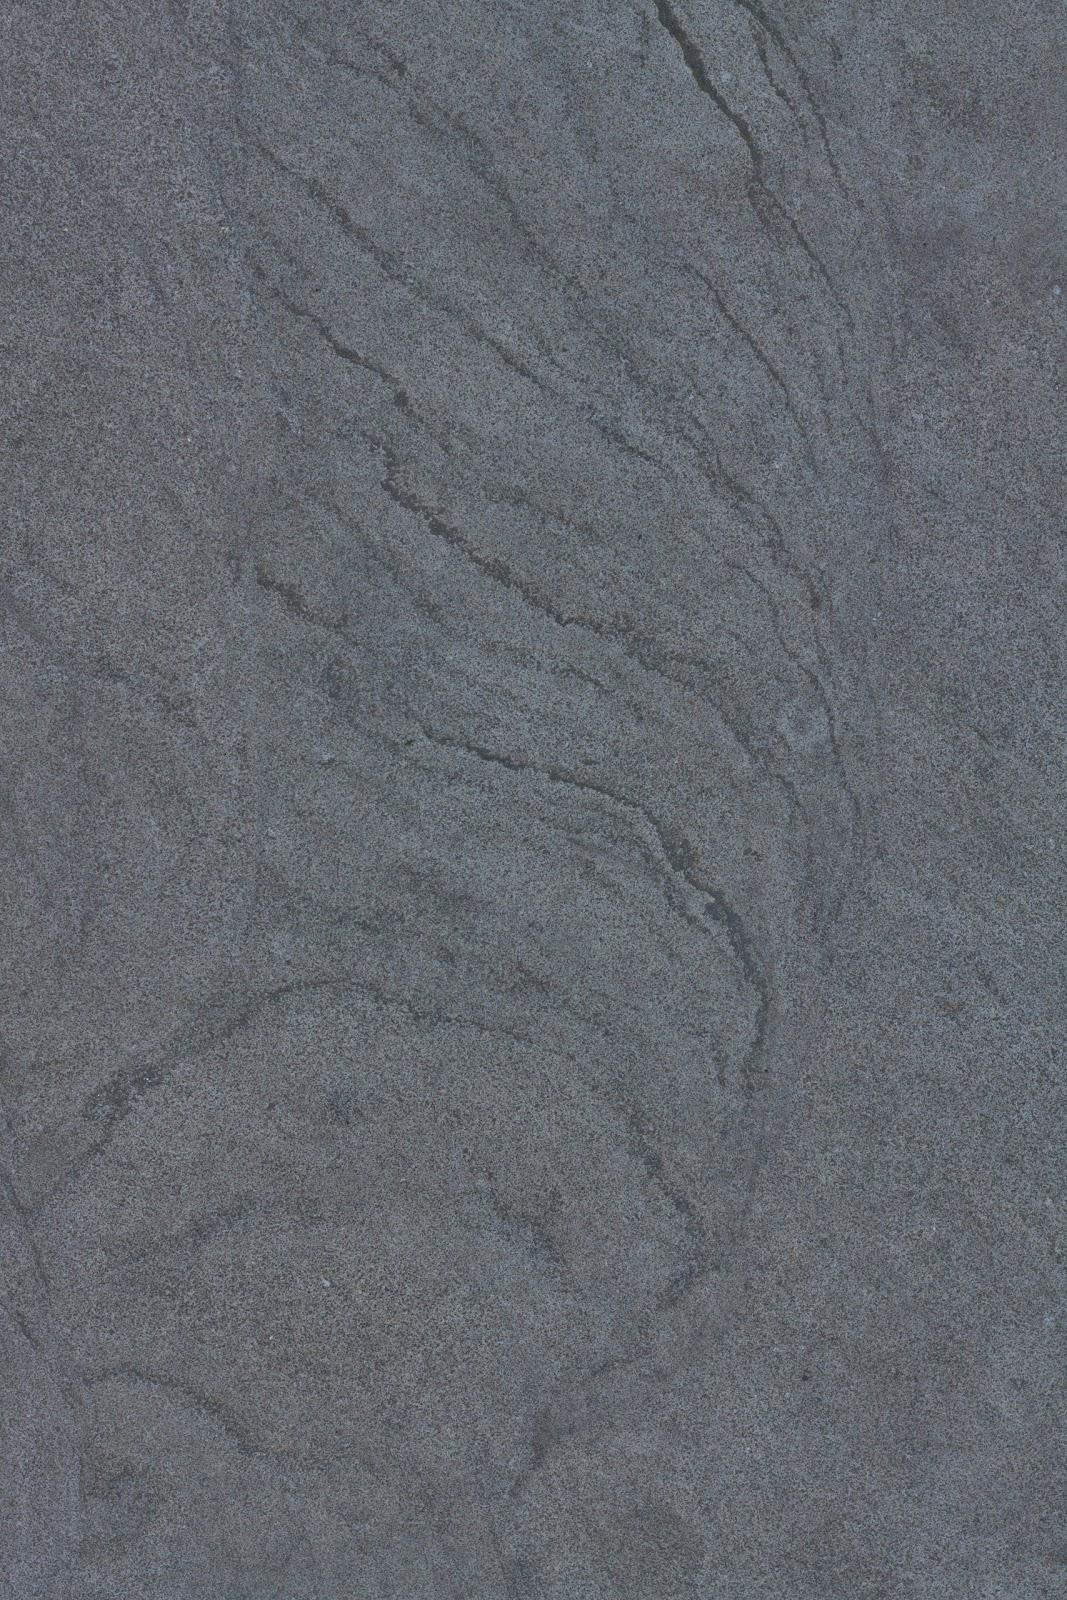 Stone slab texture 3168x4752